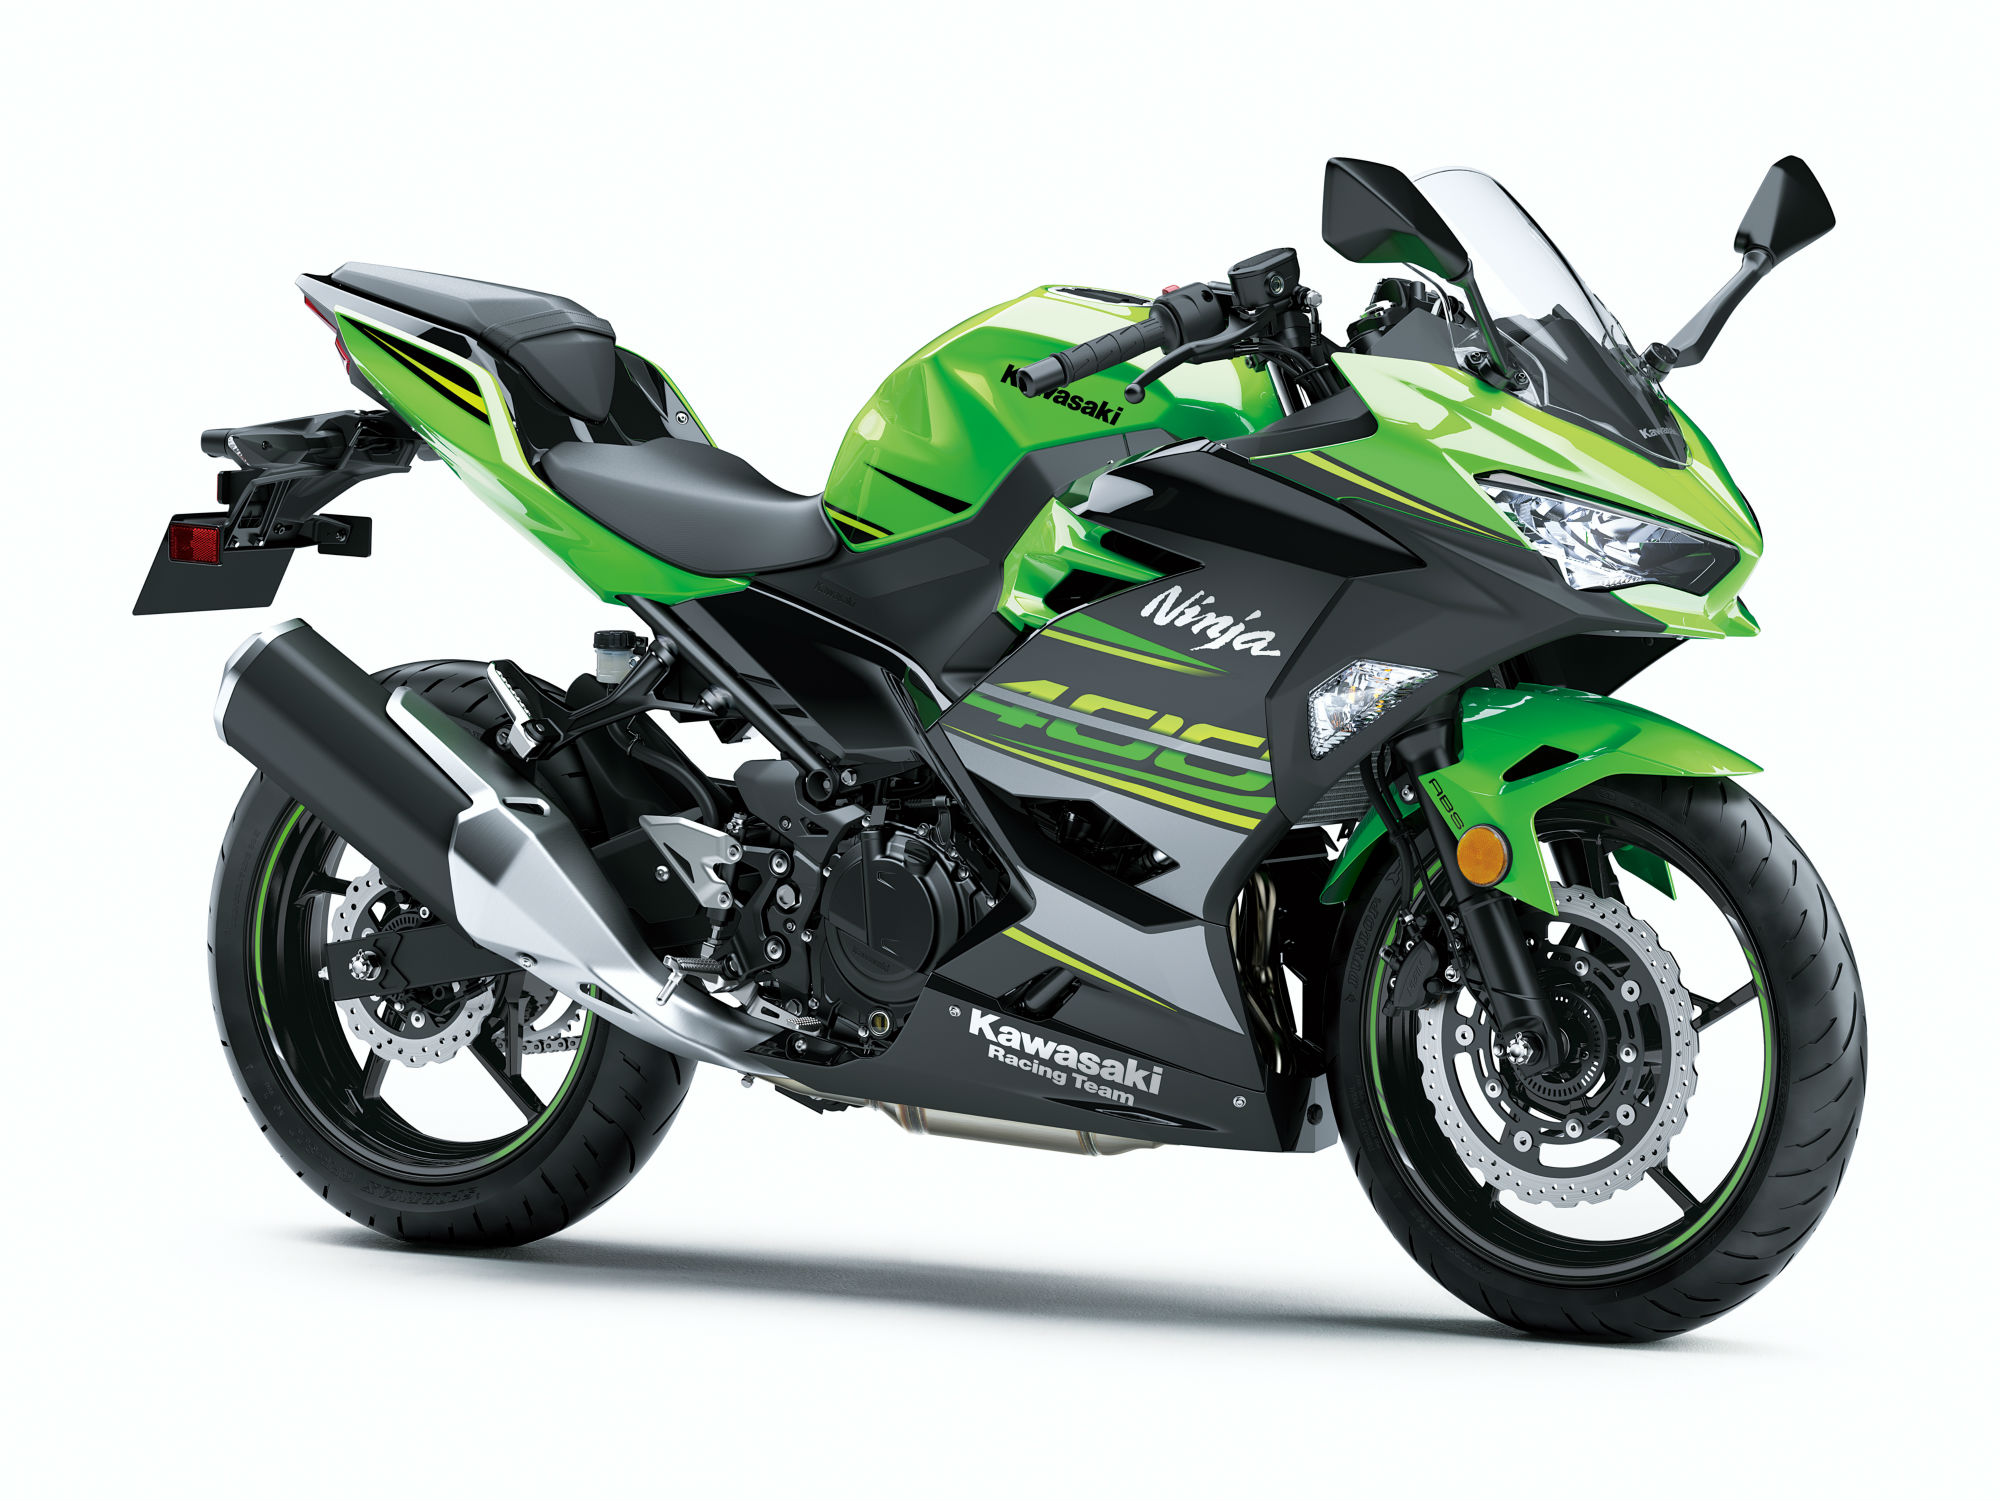 Kawasaki Ninja 400 Top Speed Run Visordown